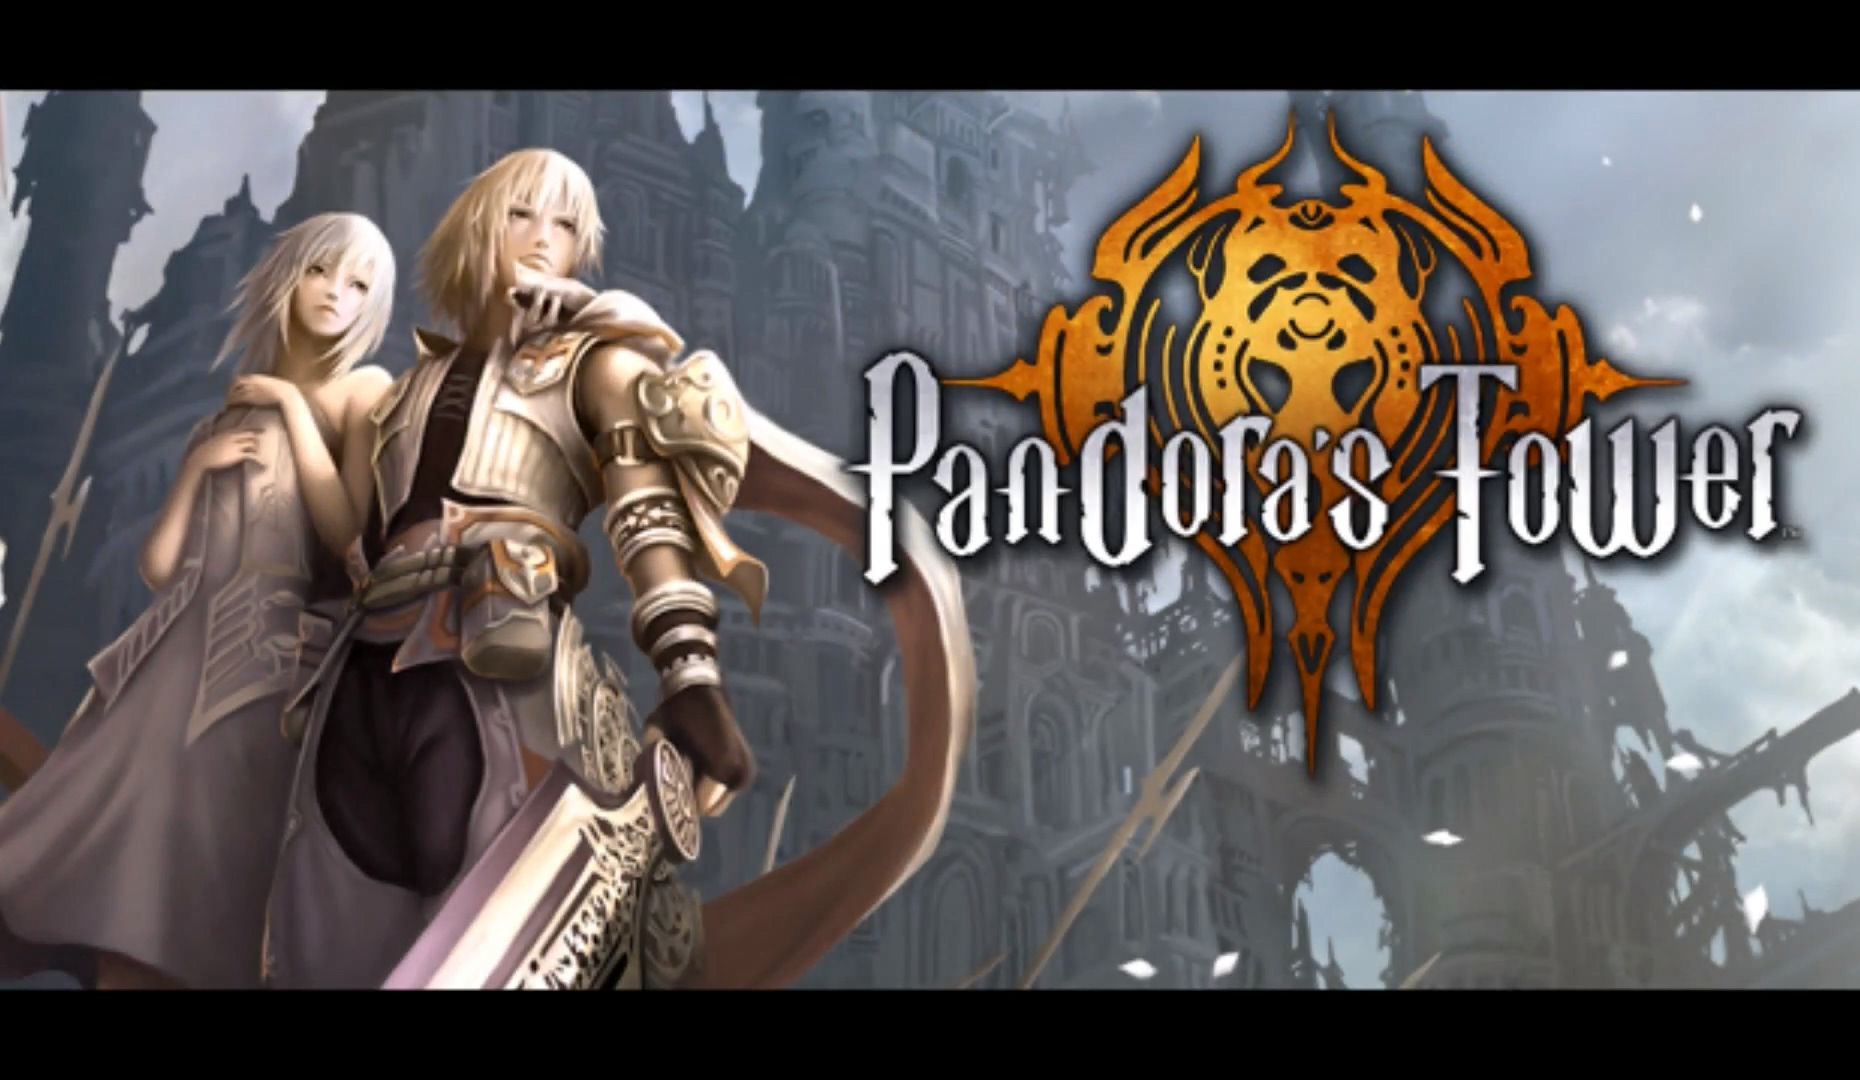 Pandora's Tower-1 00